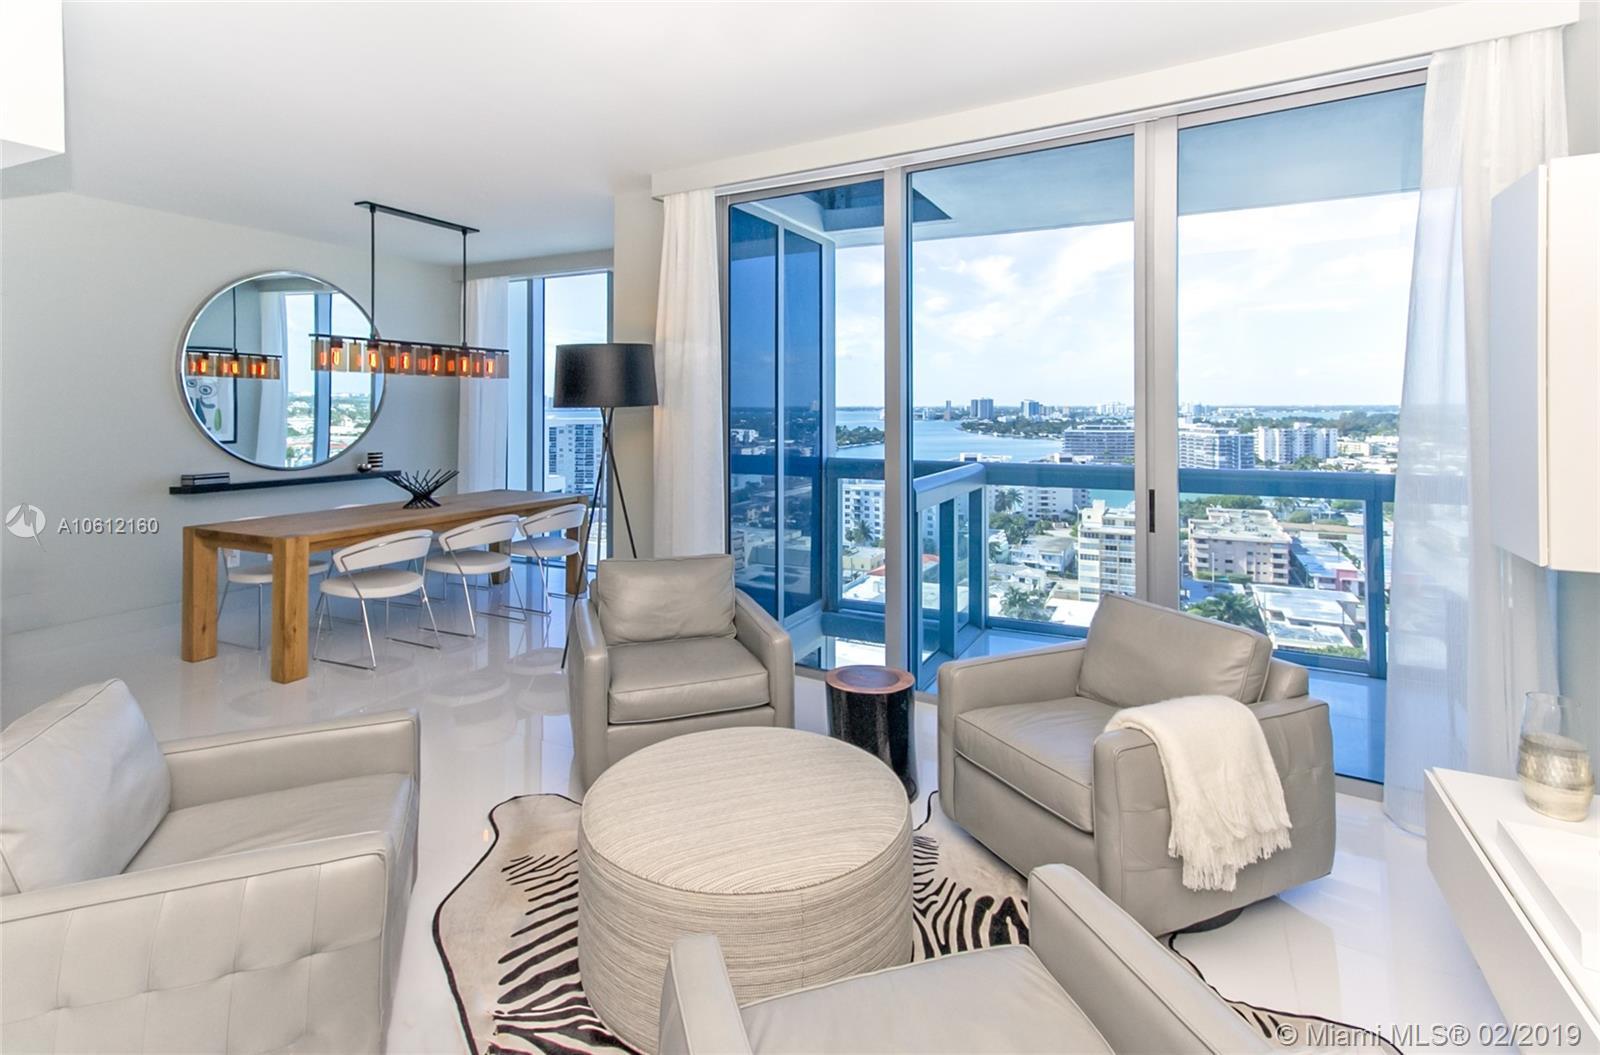 6899 Collins Ave, 1810 - Miami Beach, Florida